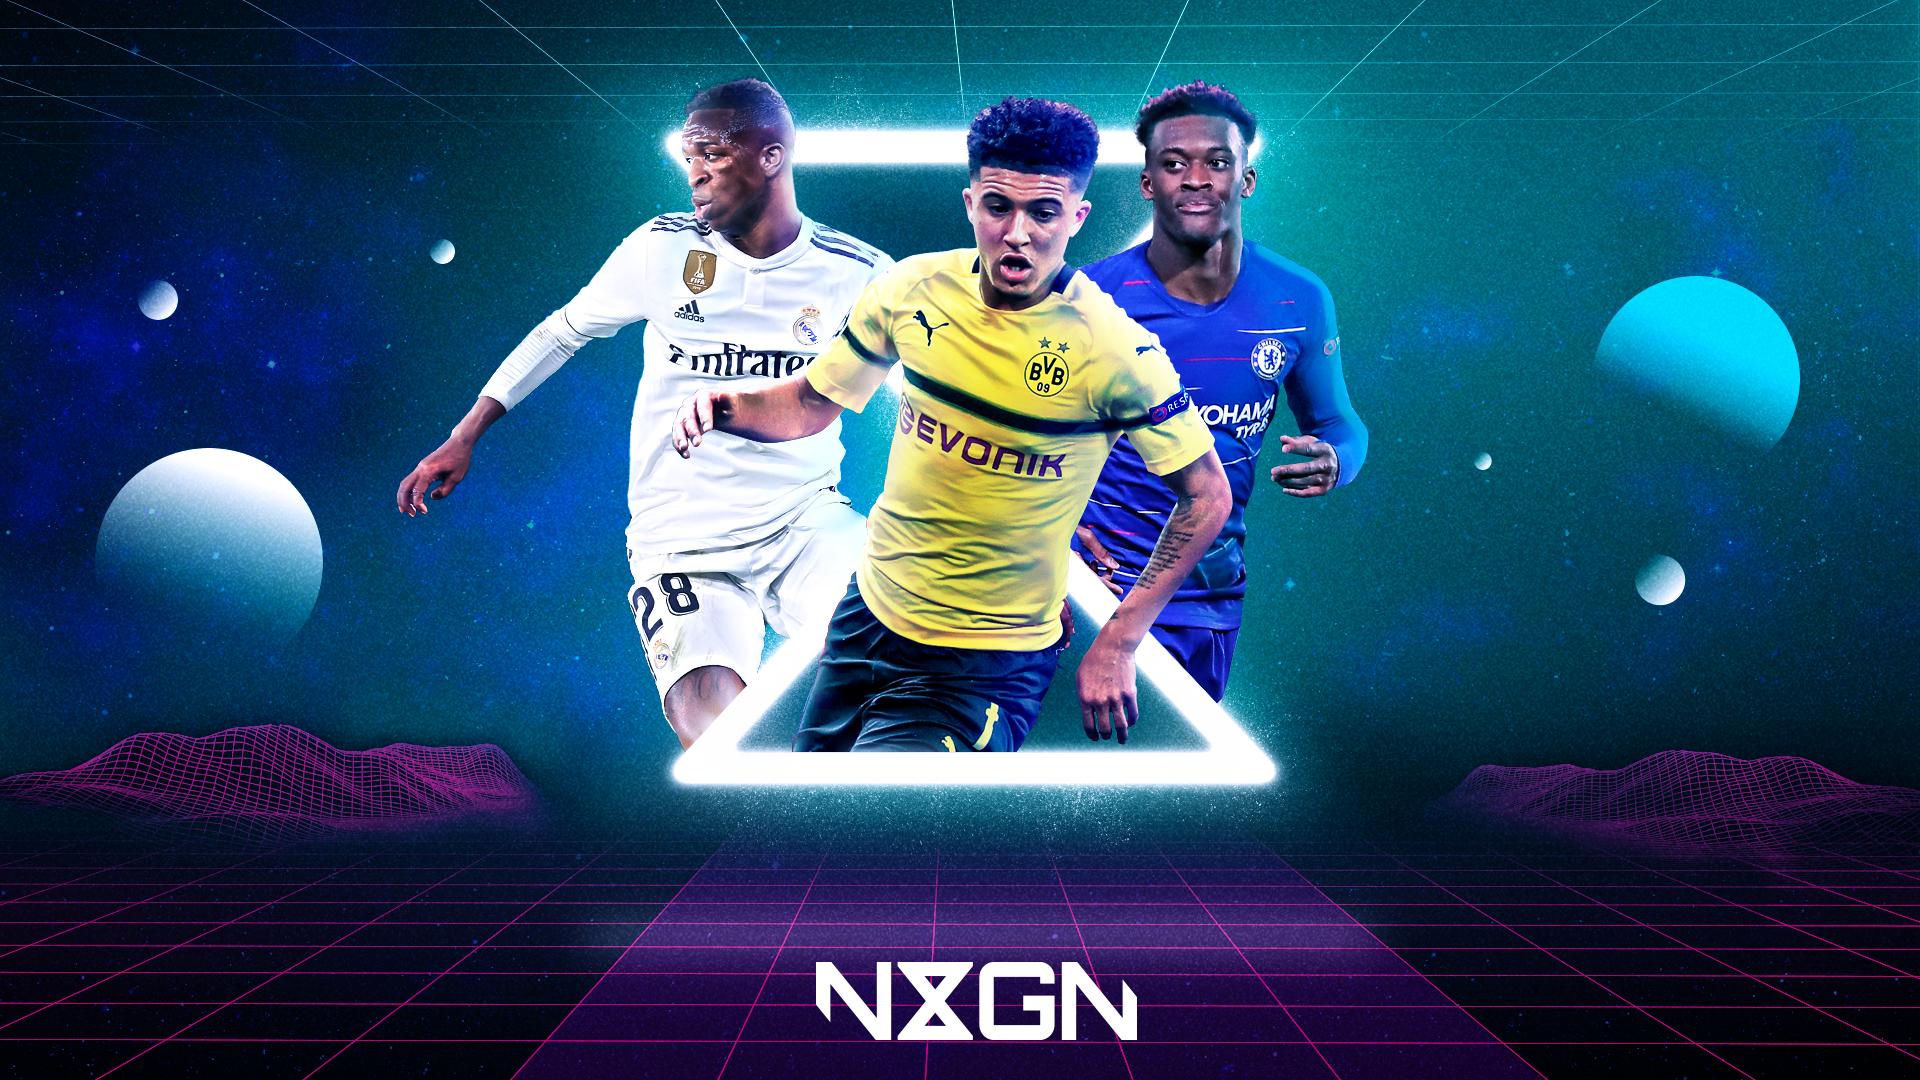 NxGn 2019: The best 50 wonderkids in football